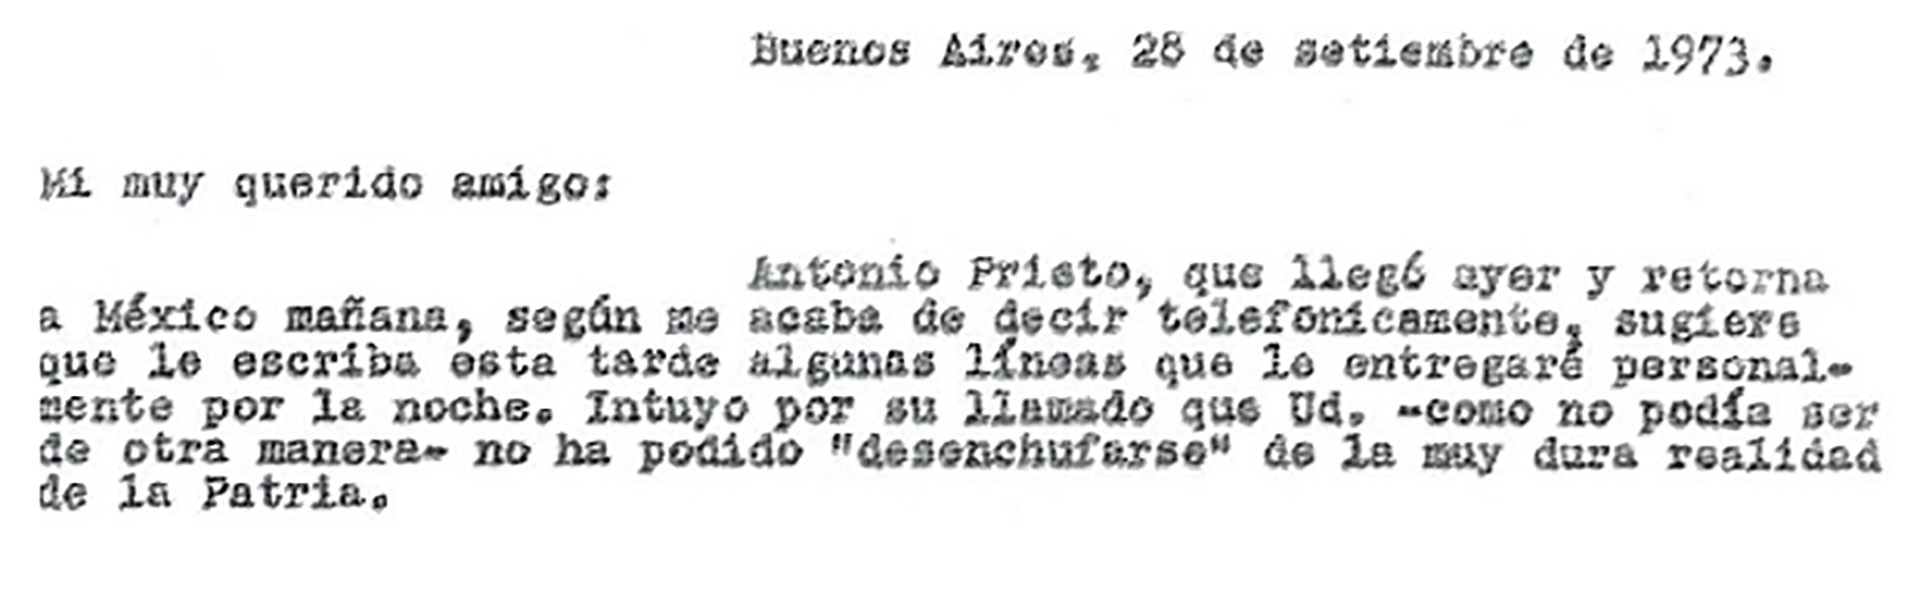 La carta del periodista Edgardo Sajón a Alejandro Agustín Lanusse, el expresidente de facto que se encontraba de viaje en México cuando asesinaron a Rucci